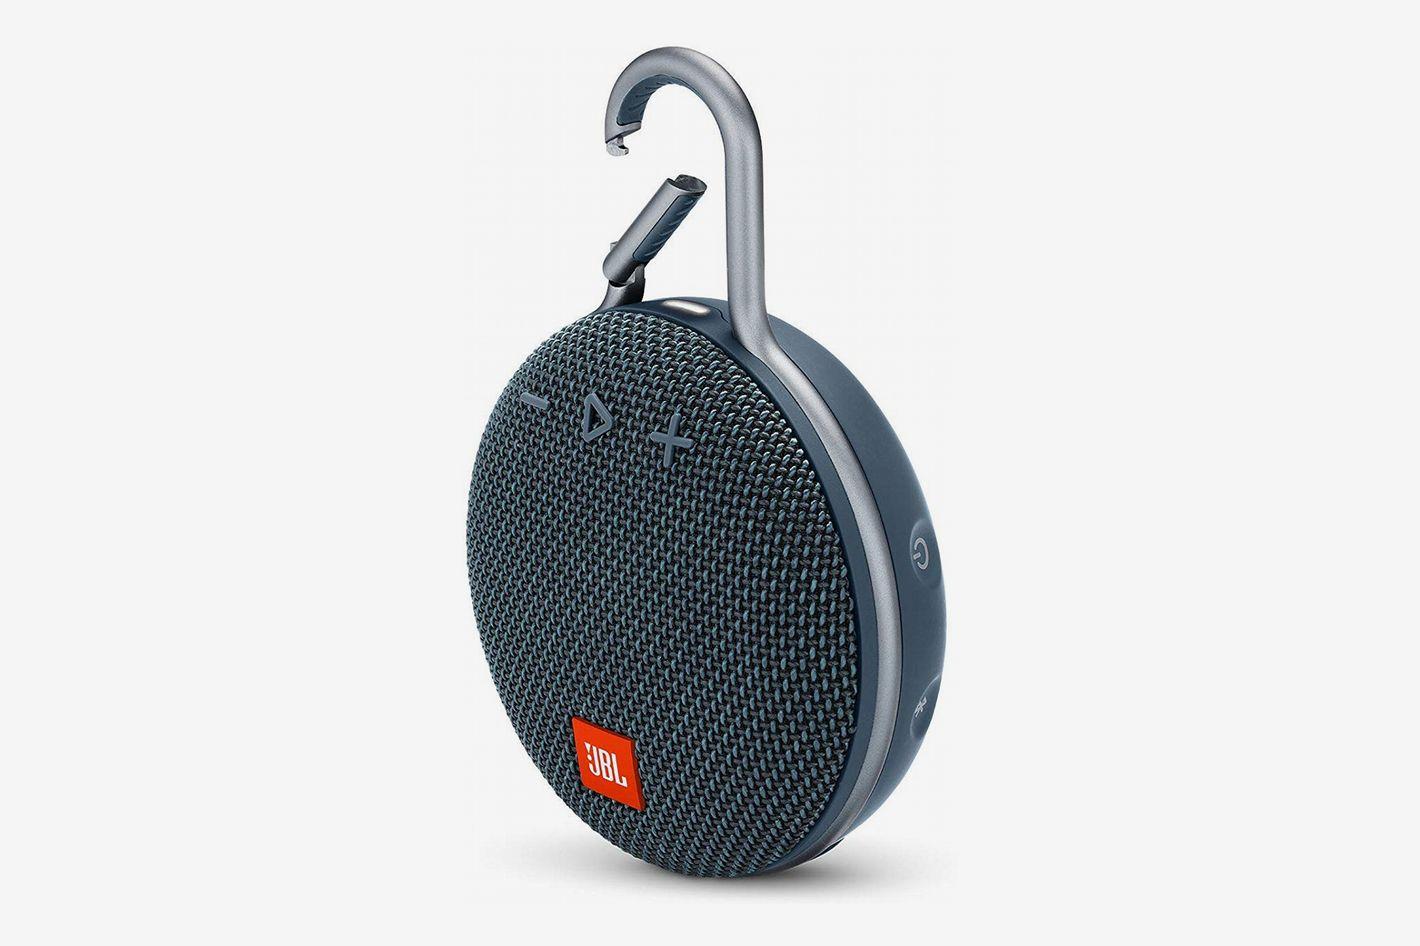 JBL Clip 3 Waterproof Speaker